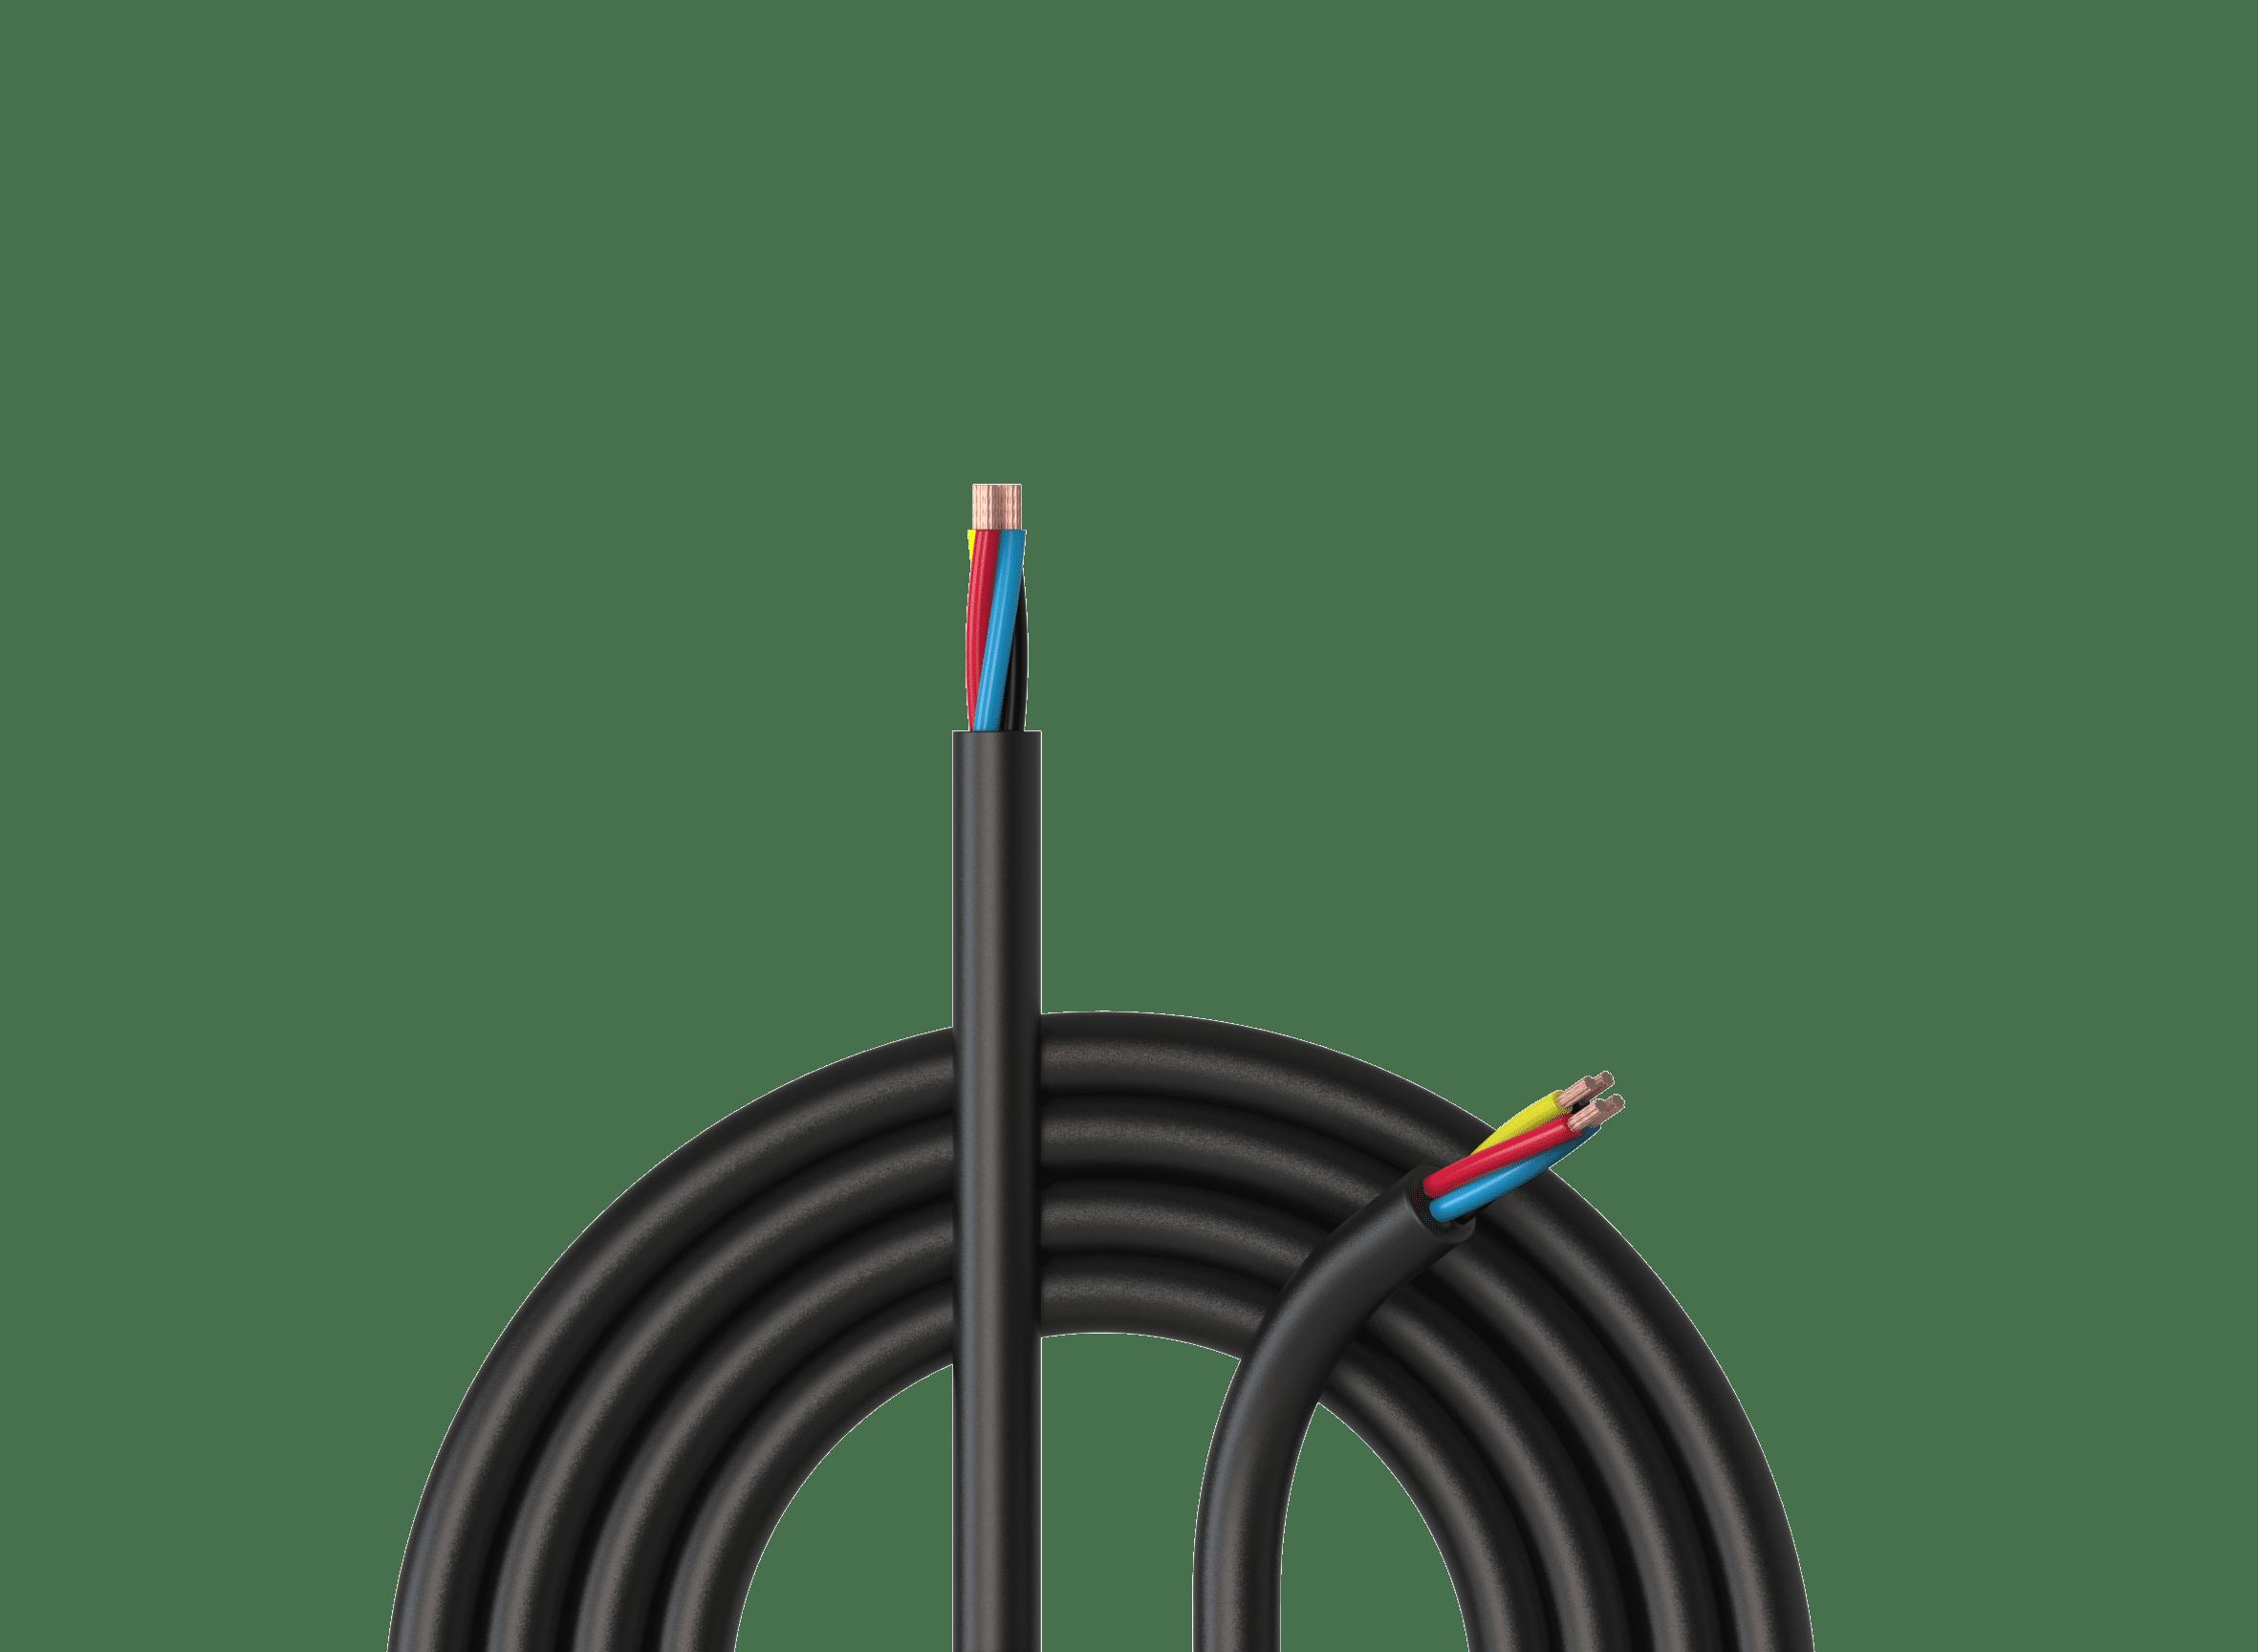 Bulk Speaker Cables Procab Audio Cable Wiring